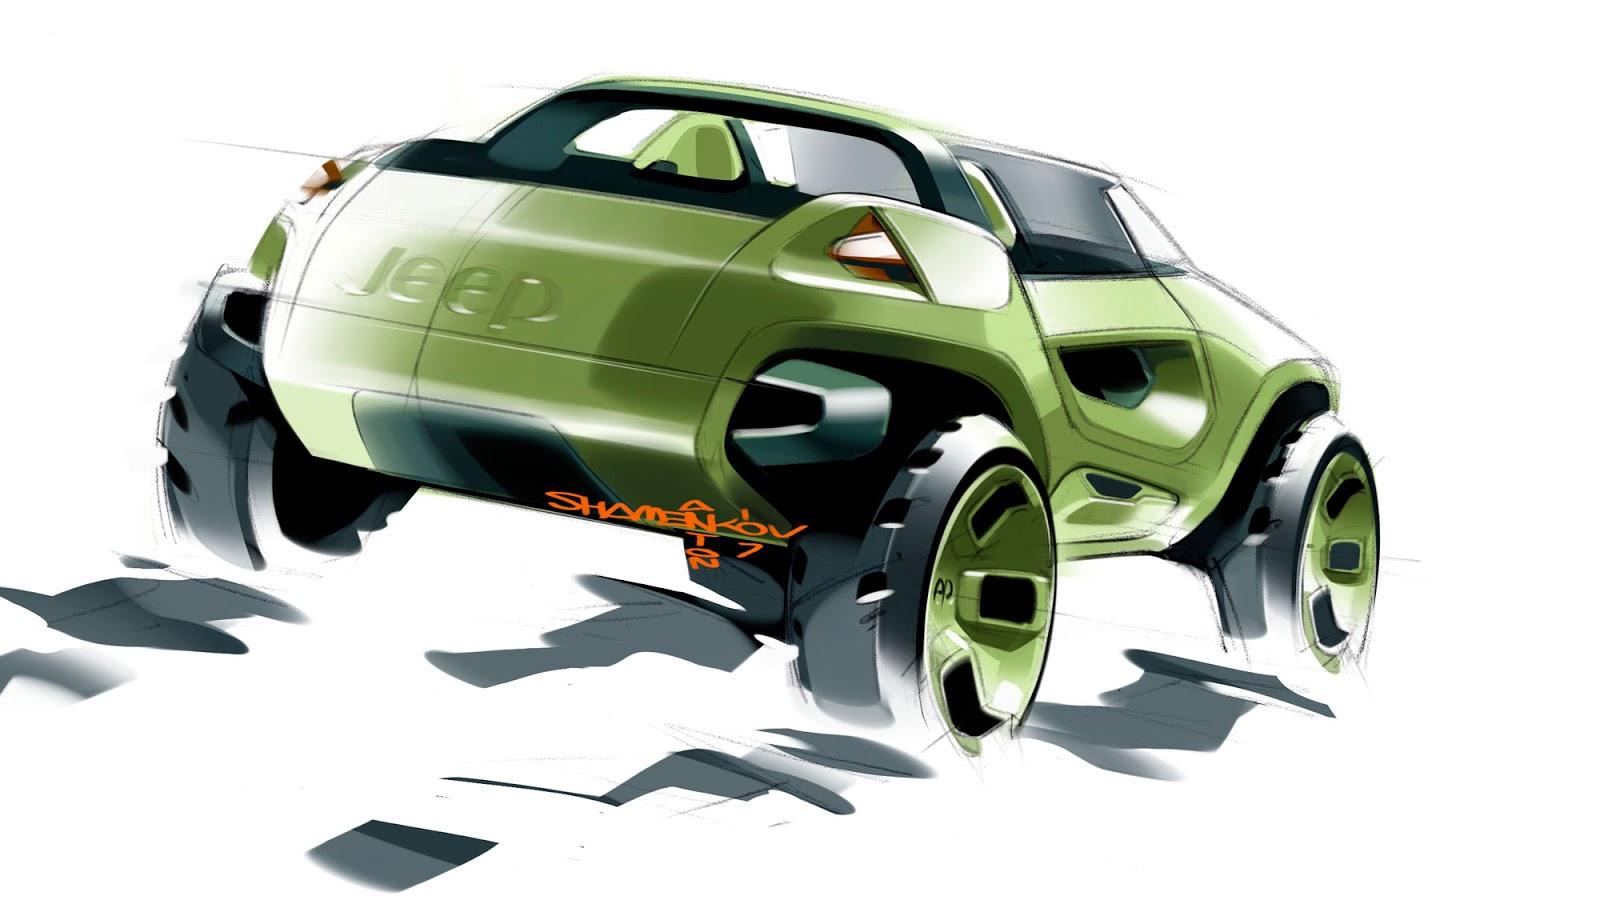 Jeep Renegade Concept 2008 - sketch by Anton Shamenkov